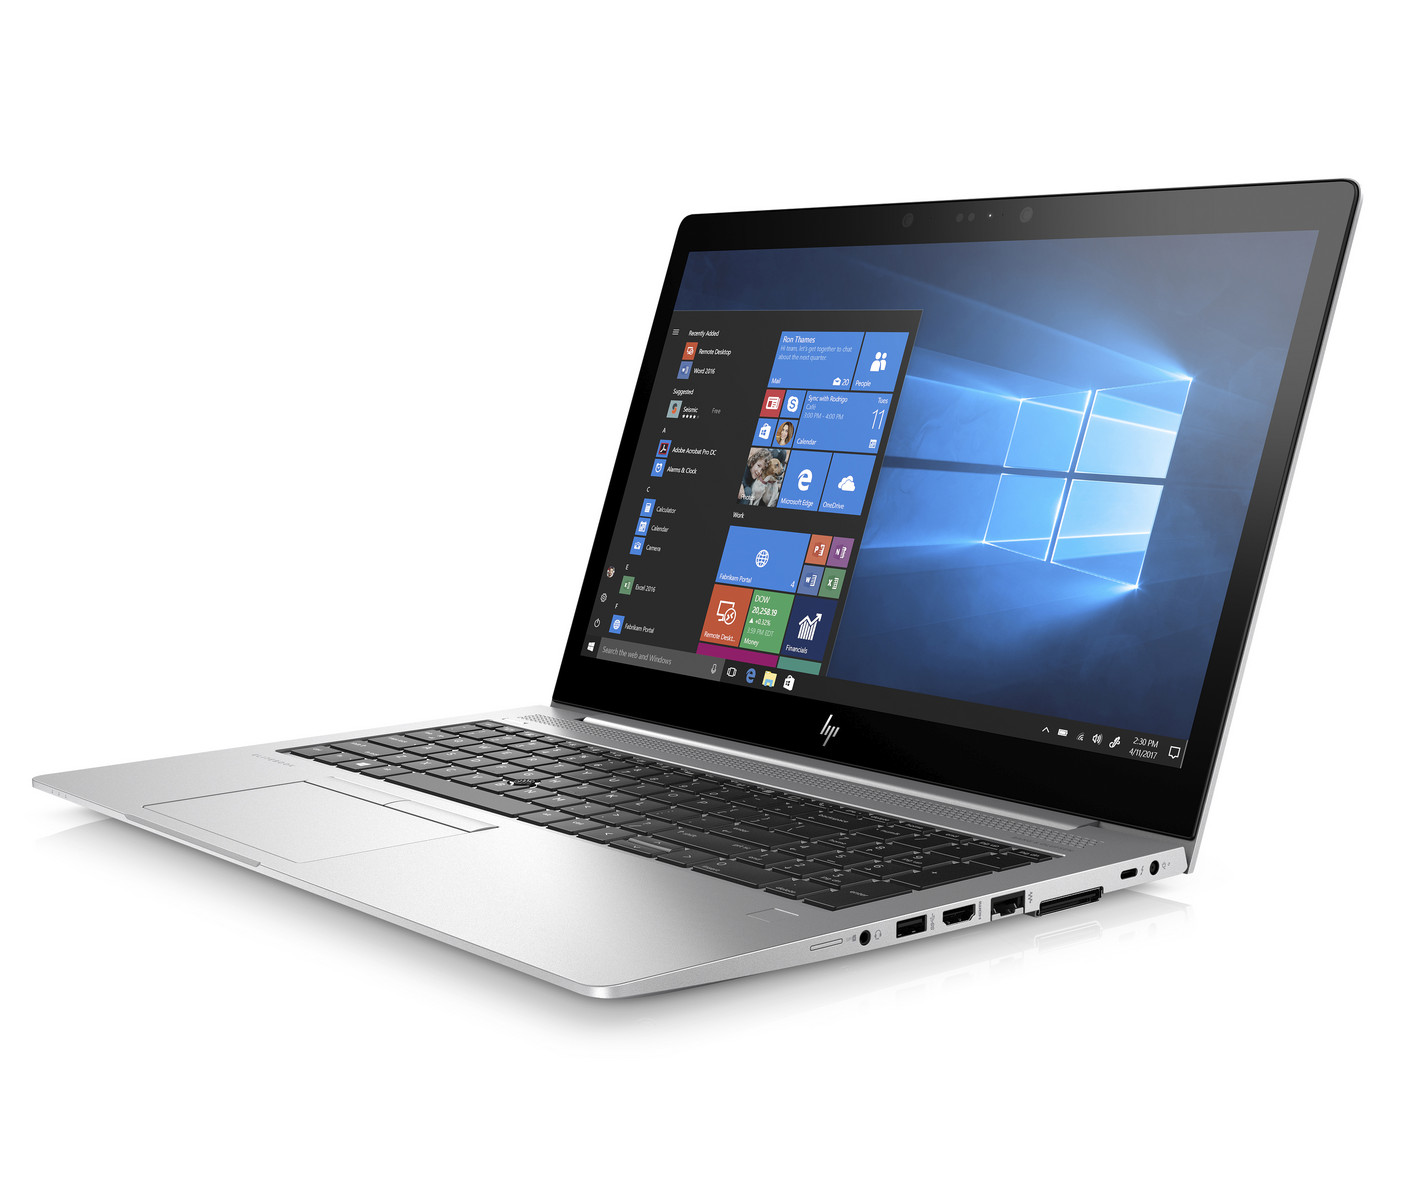 Hp Elitebook 735 745 755 G5 And Probook 645 G4 Launching